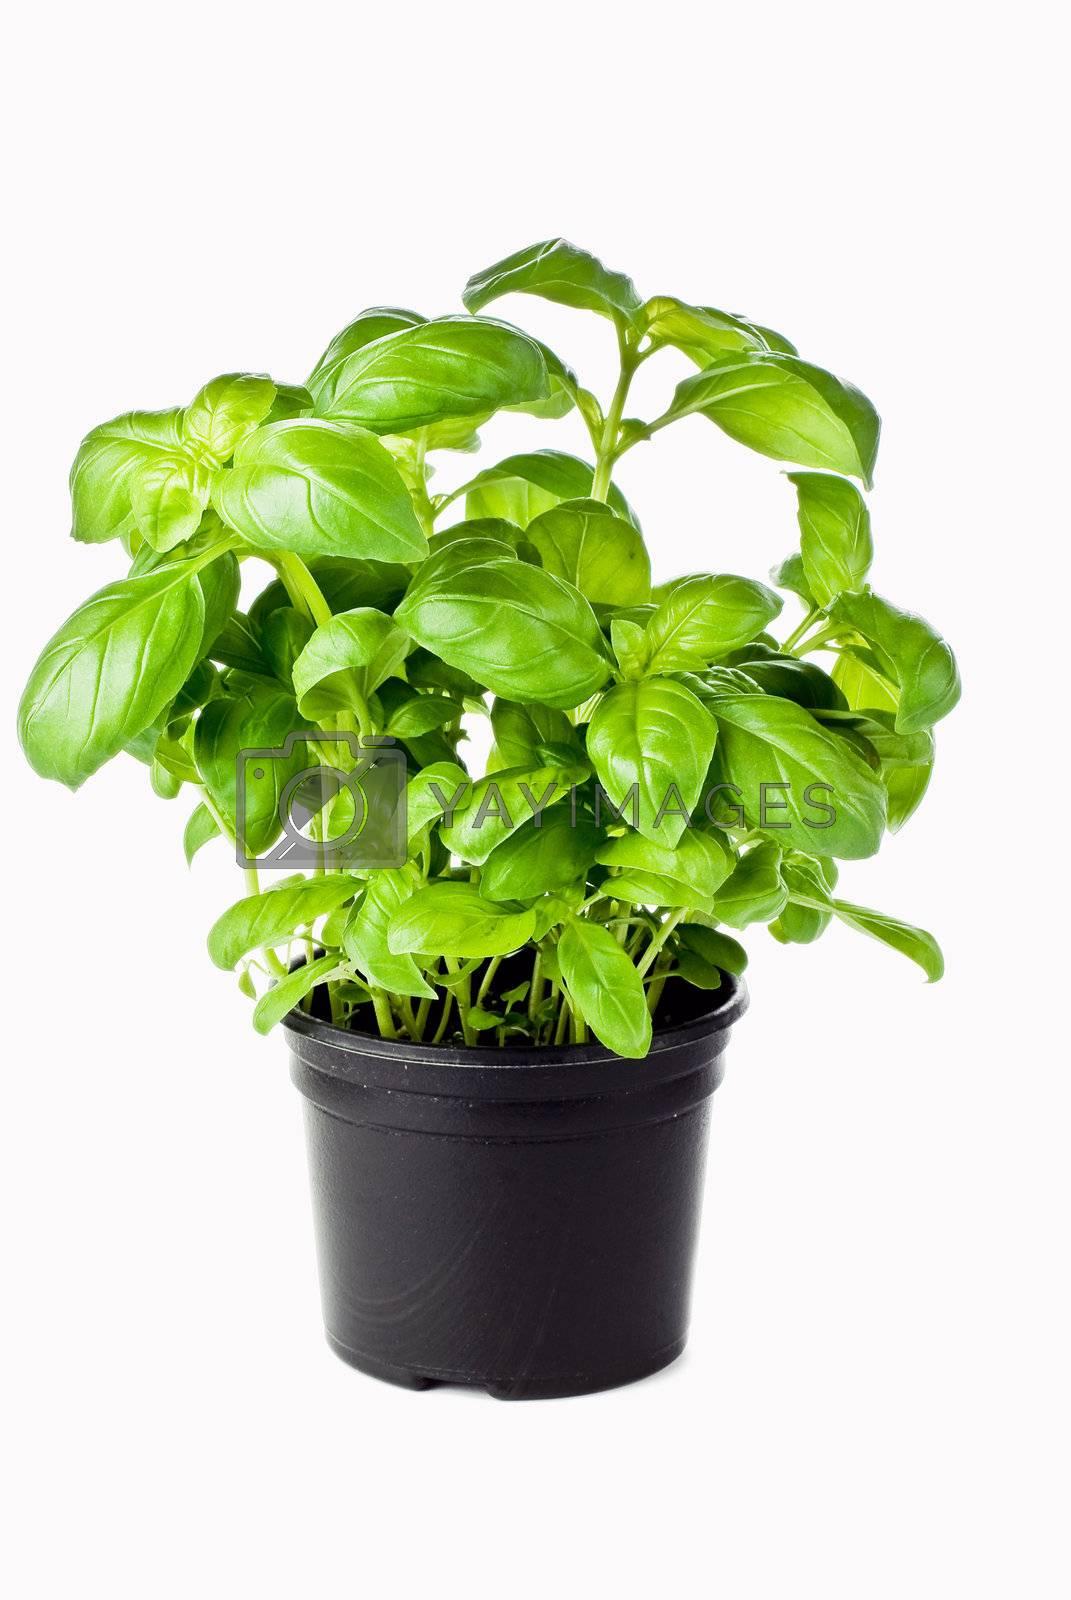 Basil in pot by caldix